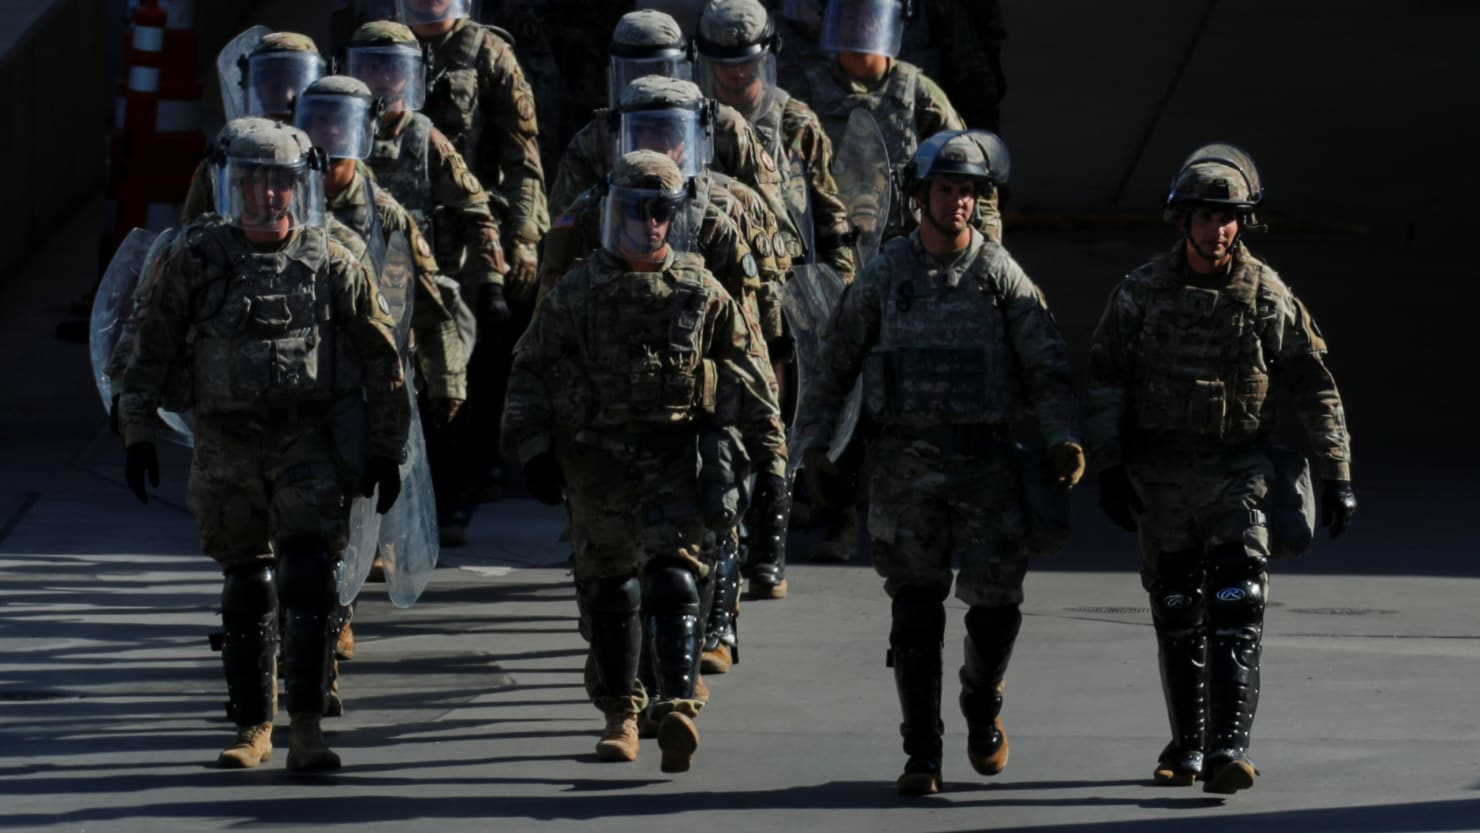 Marine Corps Commandant Warns Pentagon: Deploying Troops at Border Poses 'Unacceptable Risk'